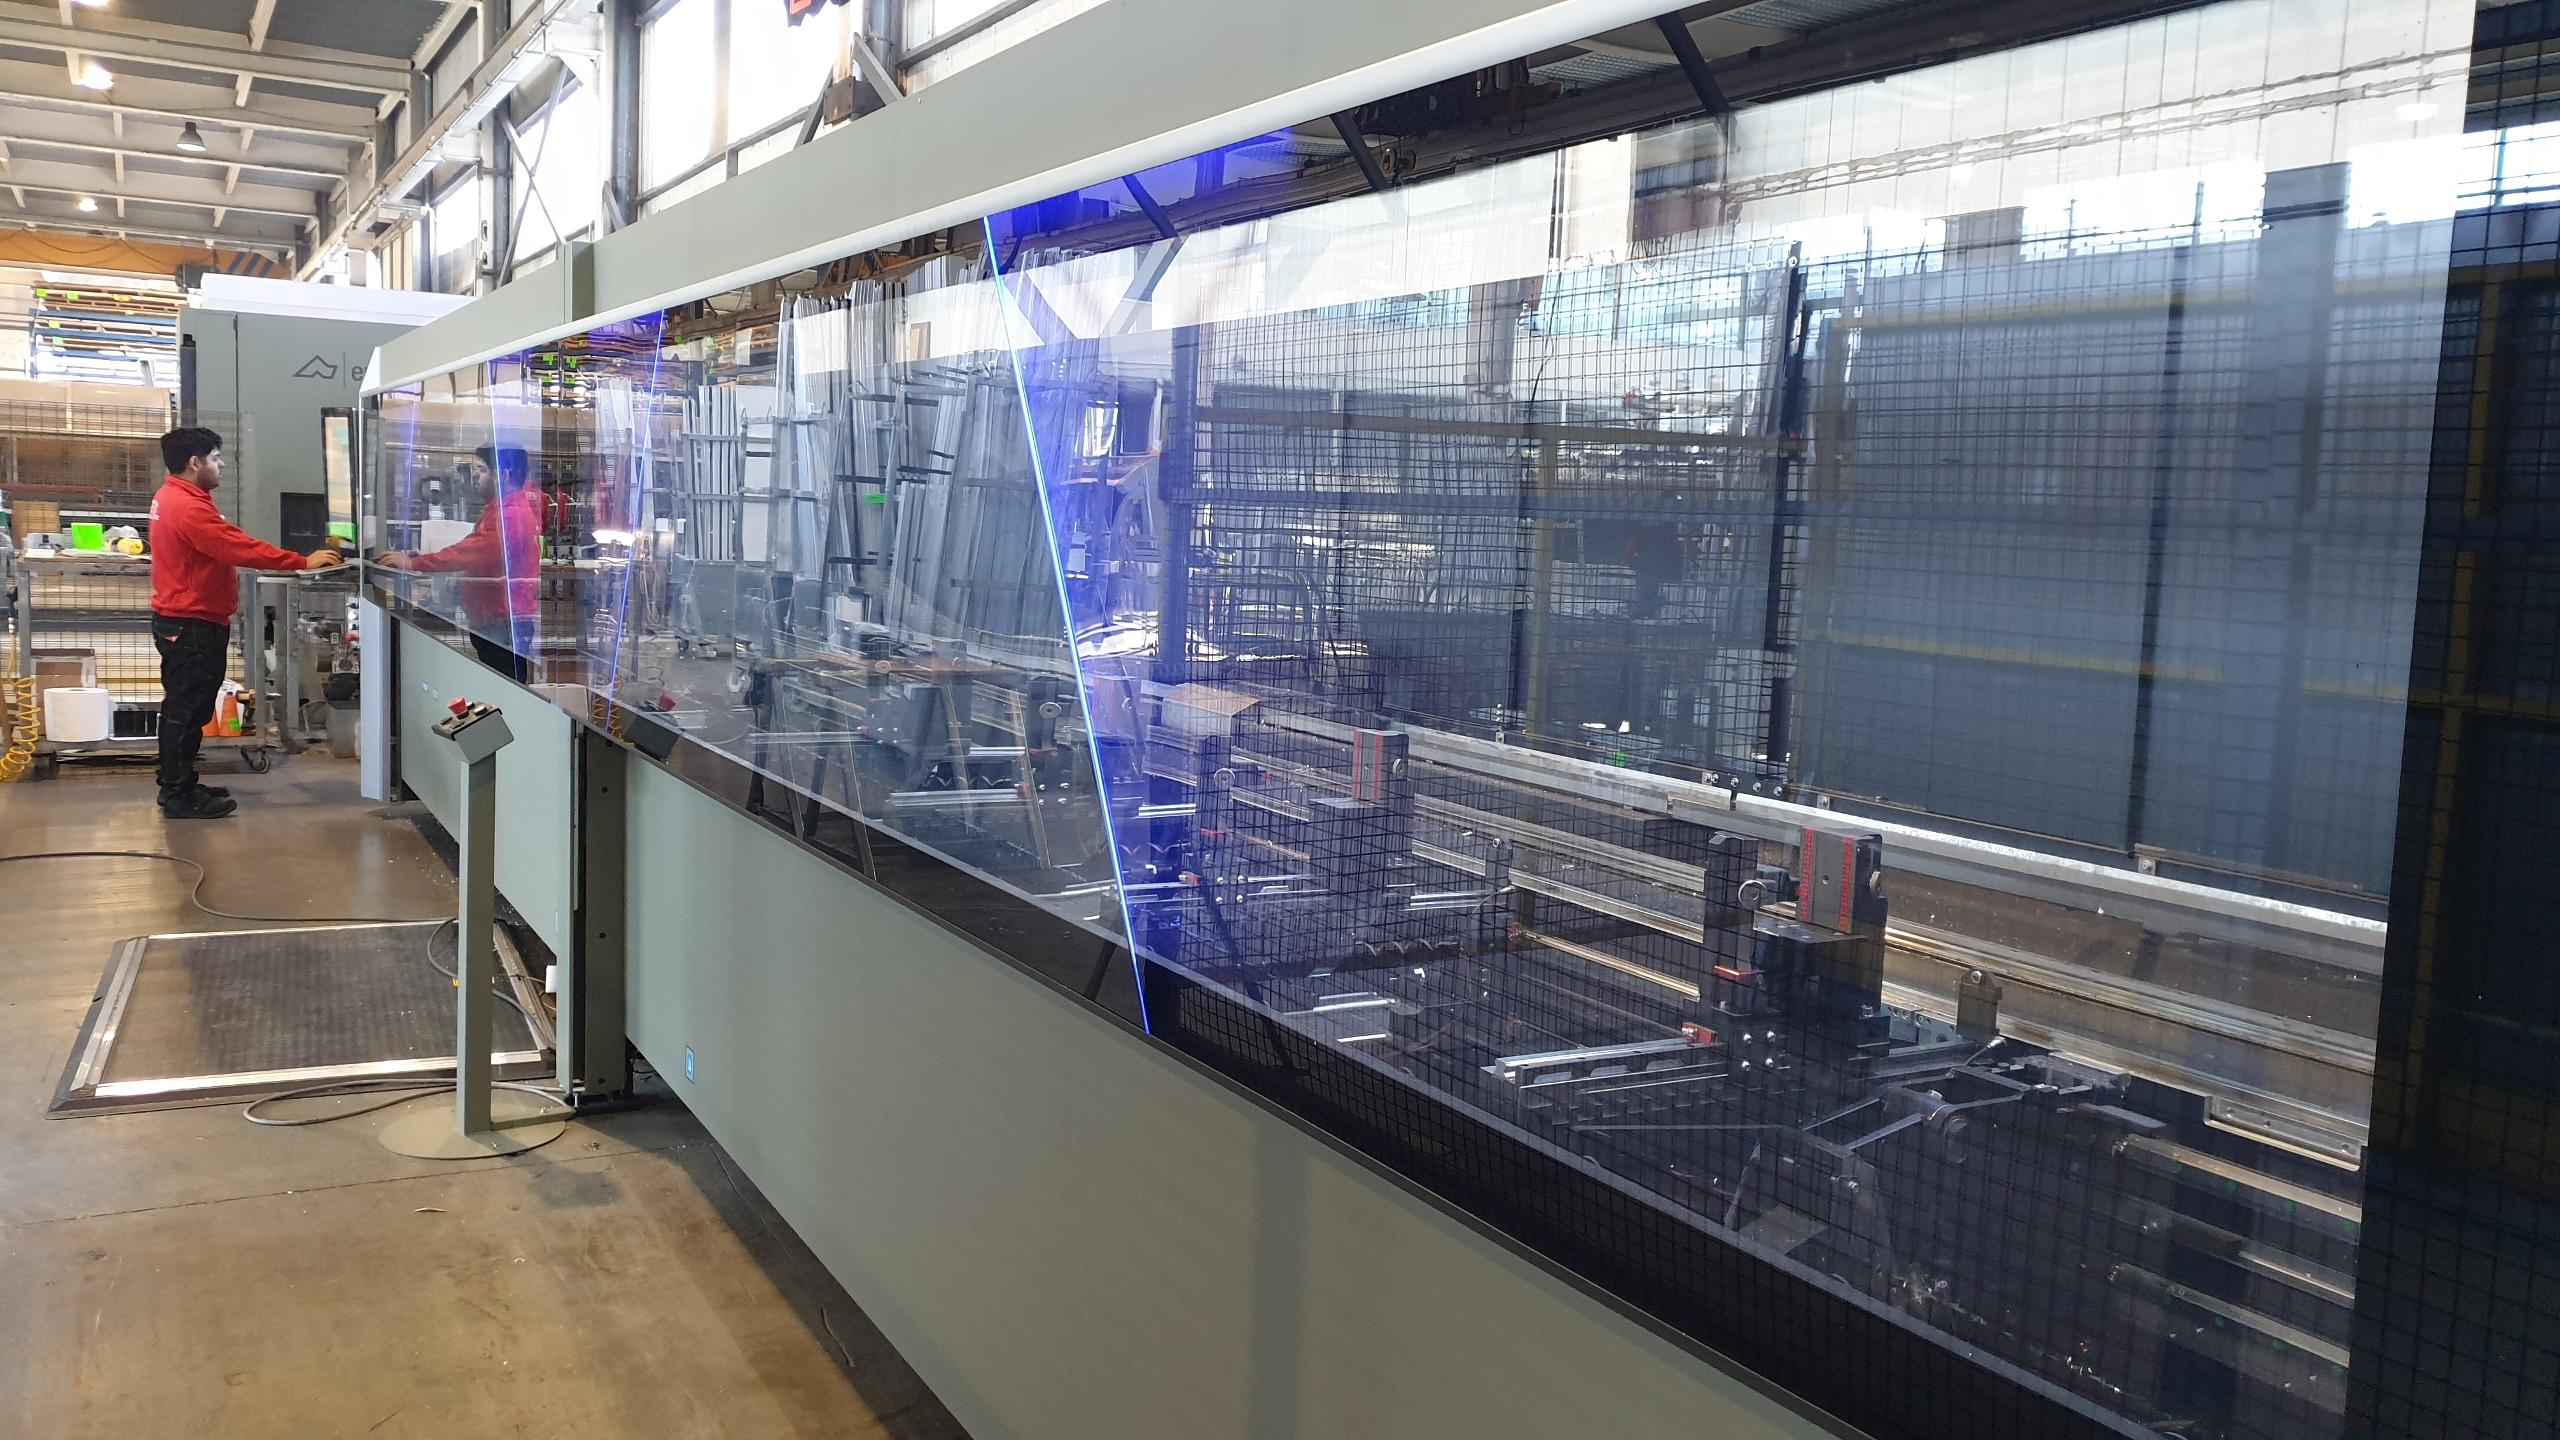 New CNC Machining Center For The GARCIA FAURA Aluminum Workshop